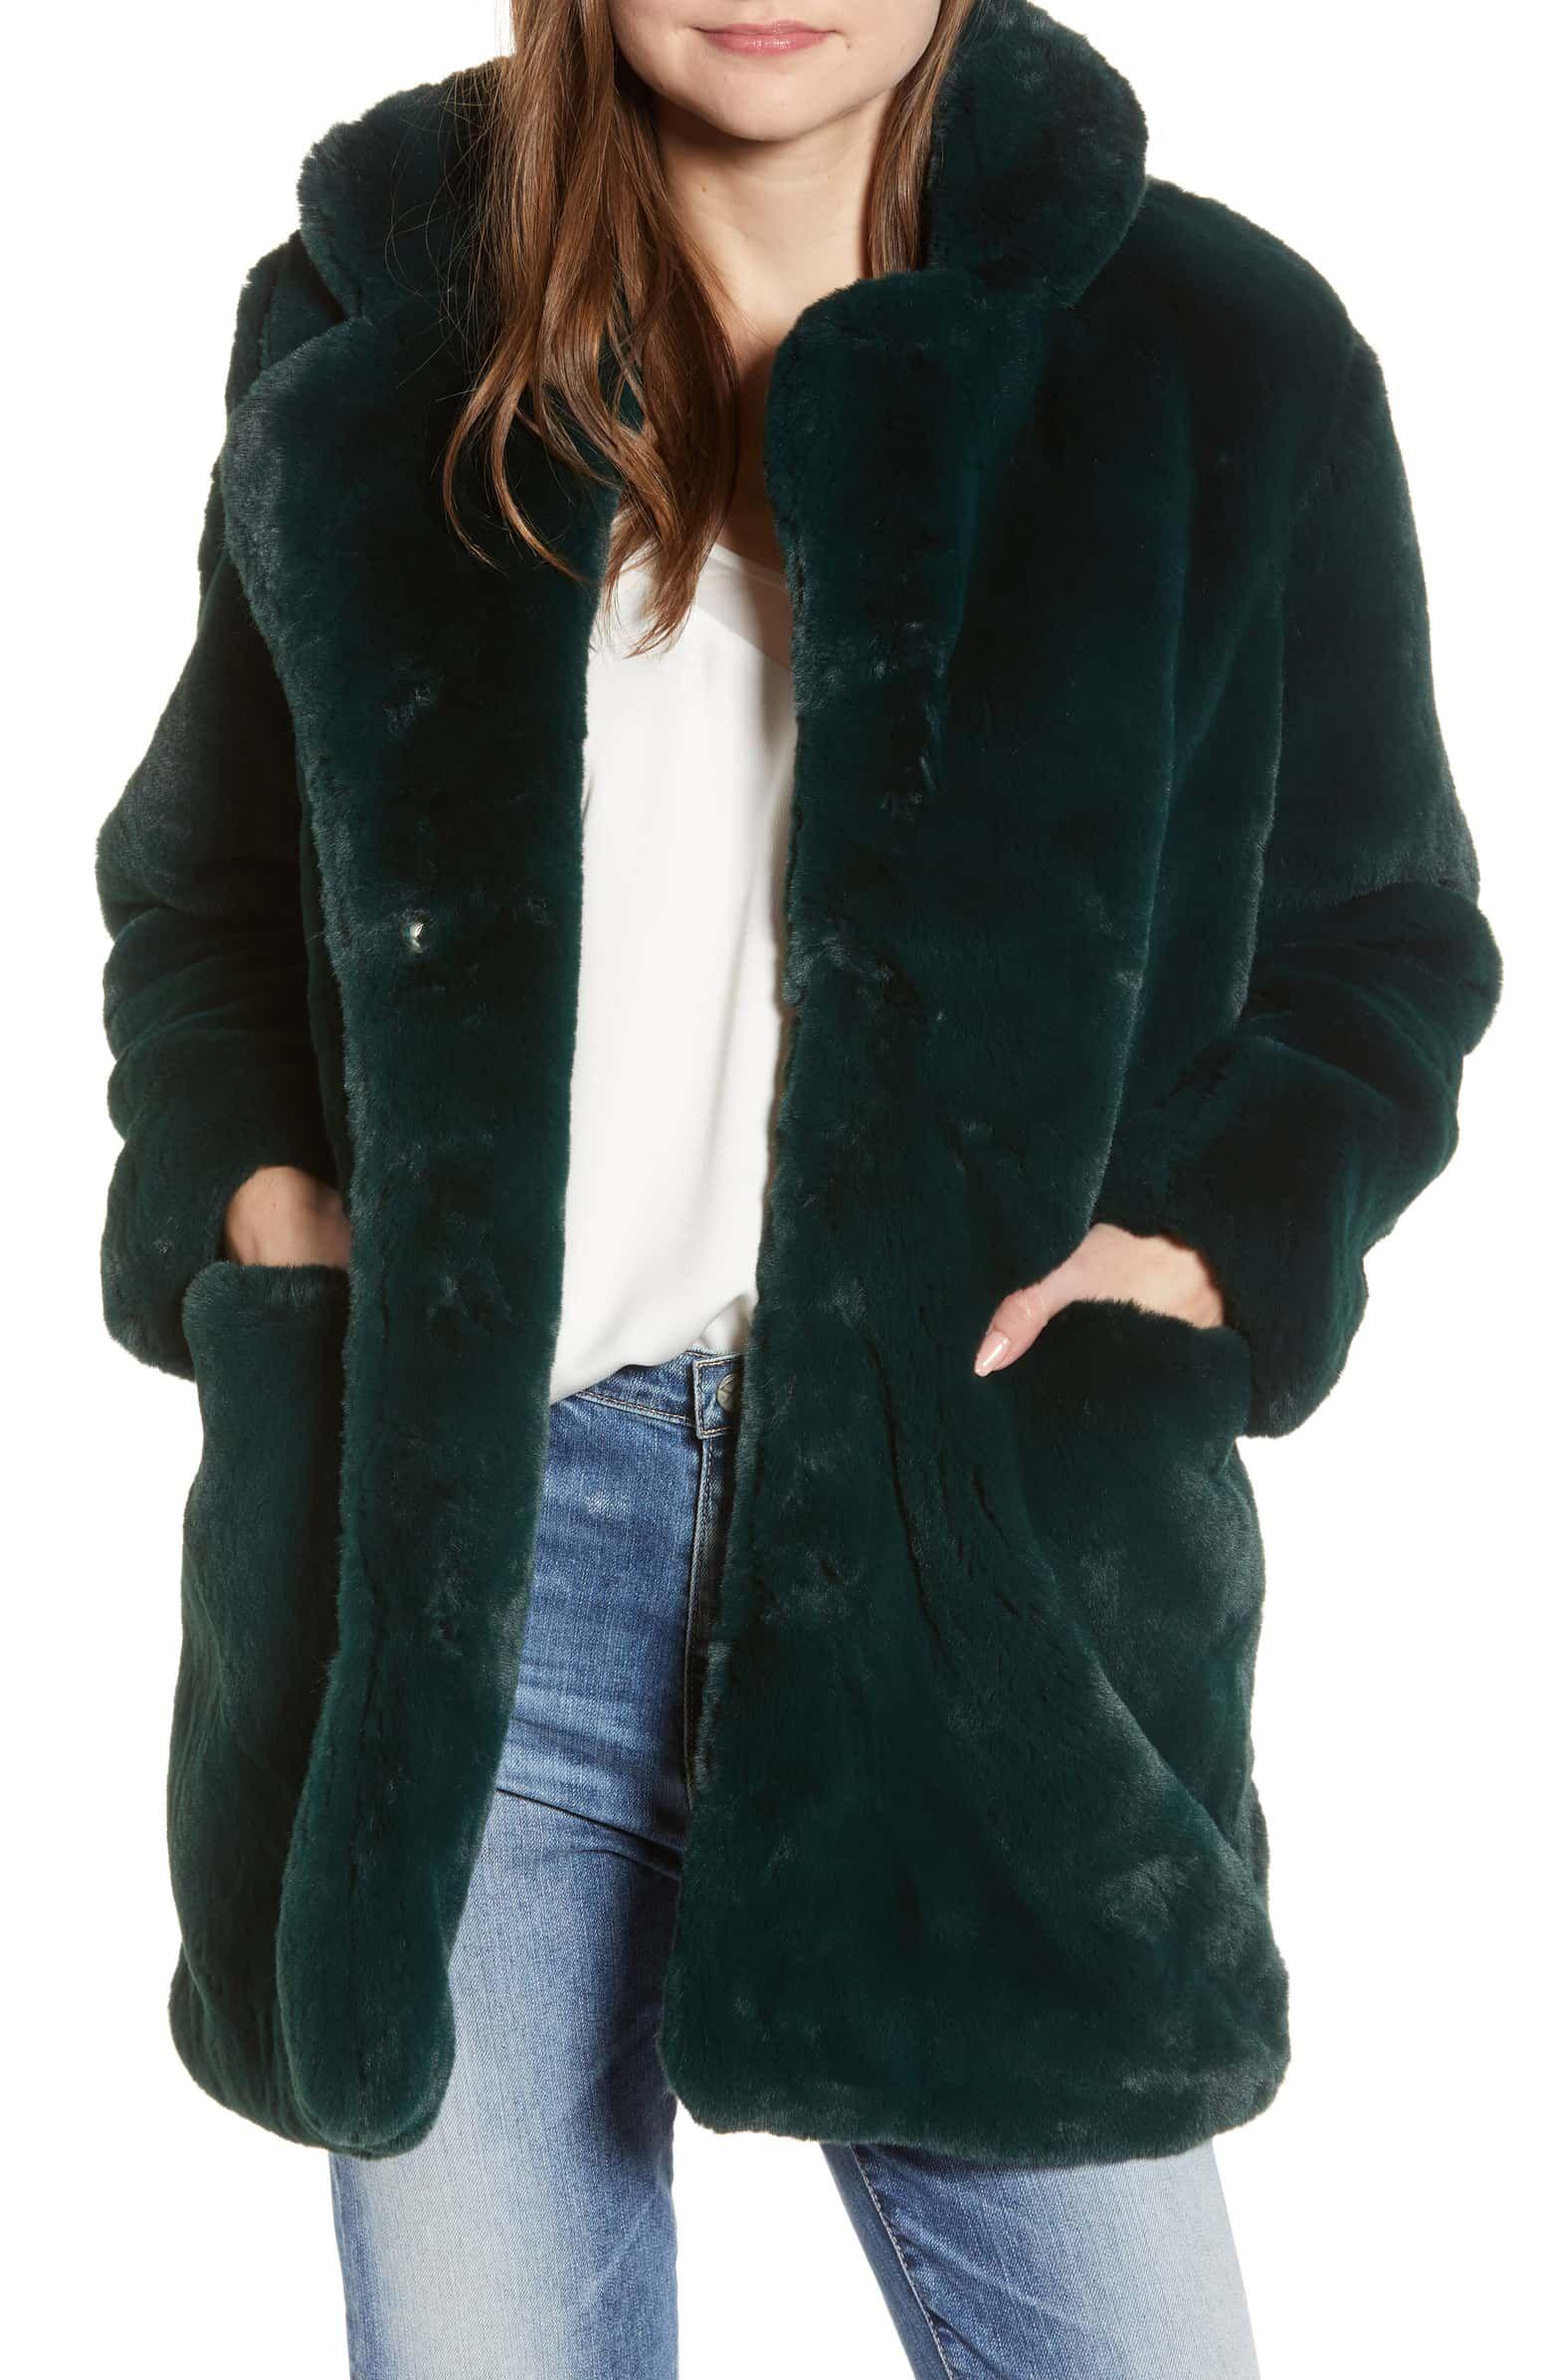 Apparis Sophie Faux Fur Coat Nordstrom Green Faux Fur Coat Fur Coat Fur Coat Outfit [ 2392 x 1560 Pixel ]